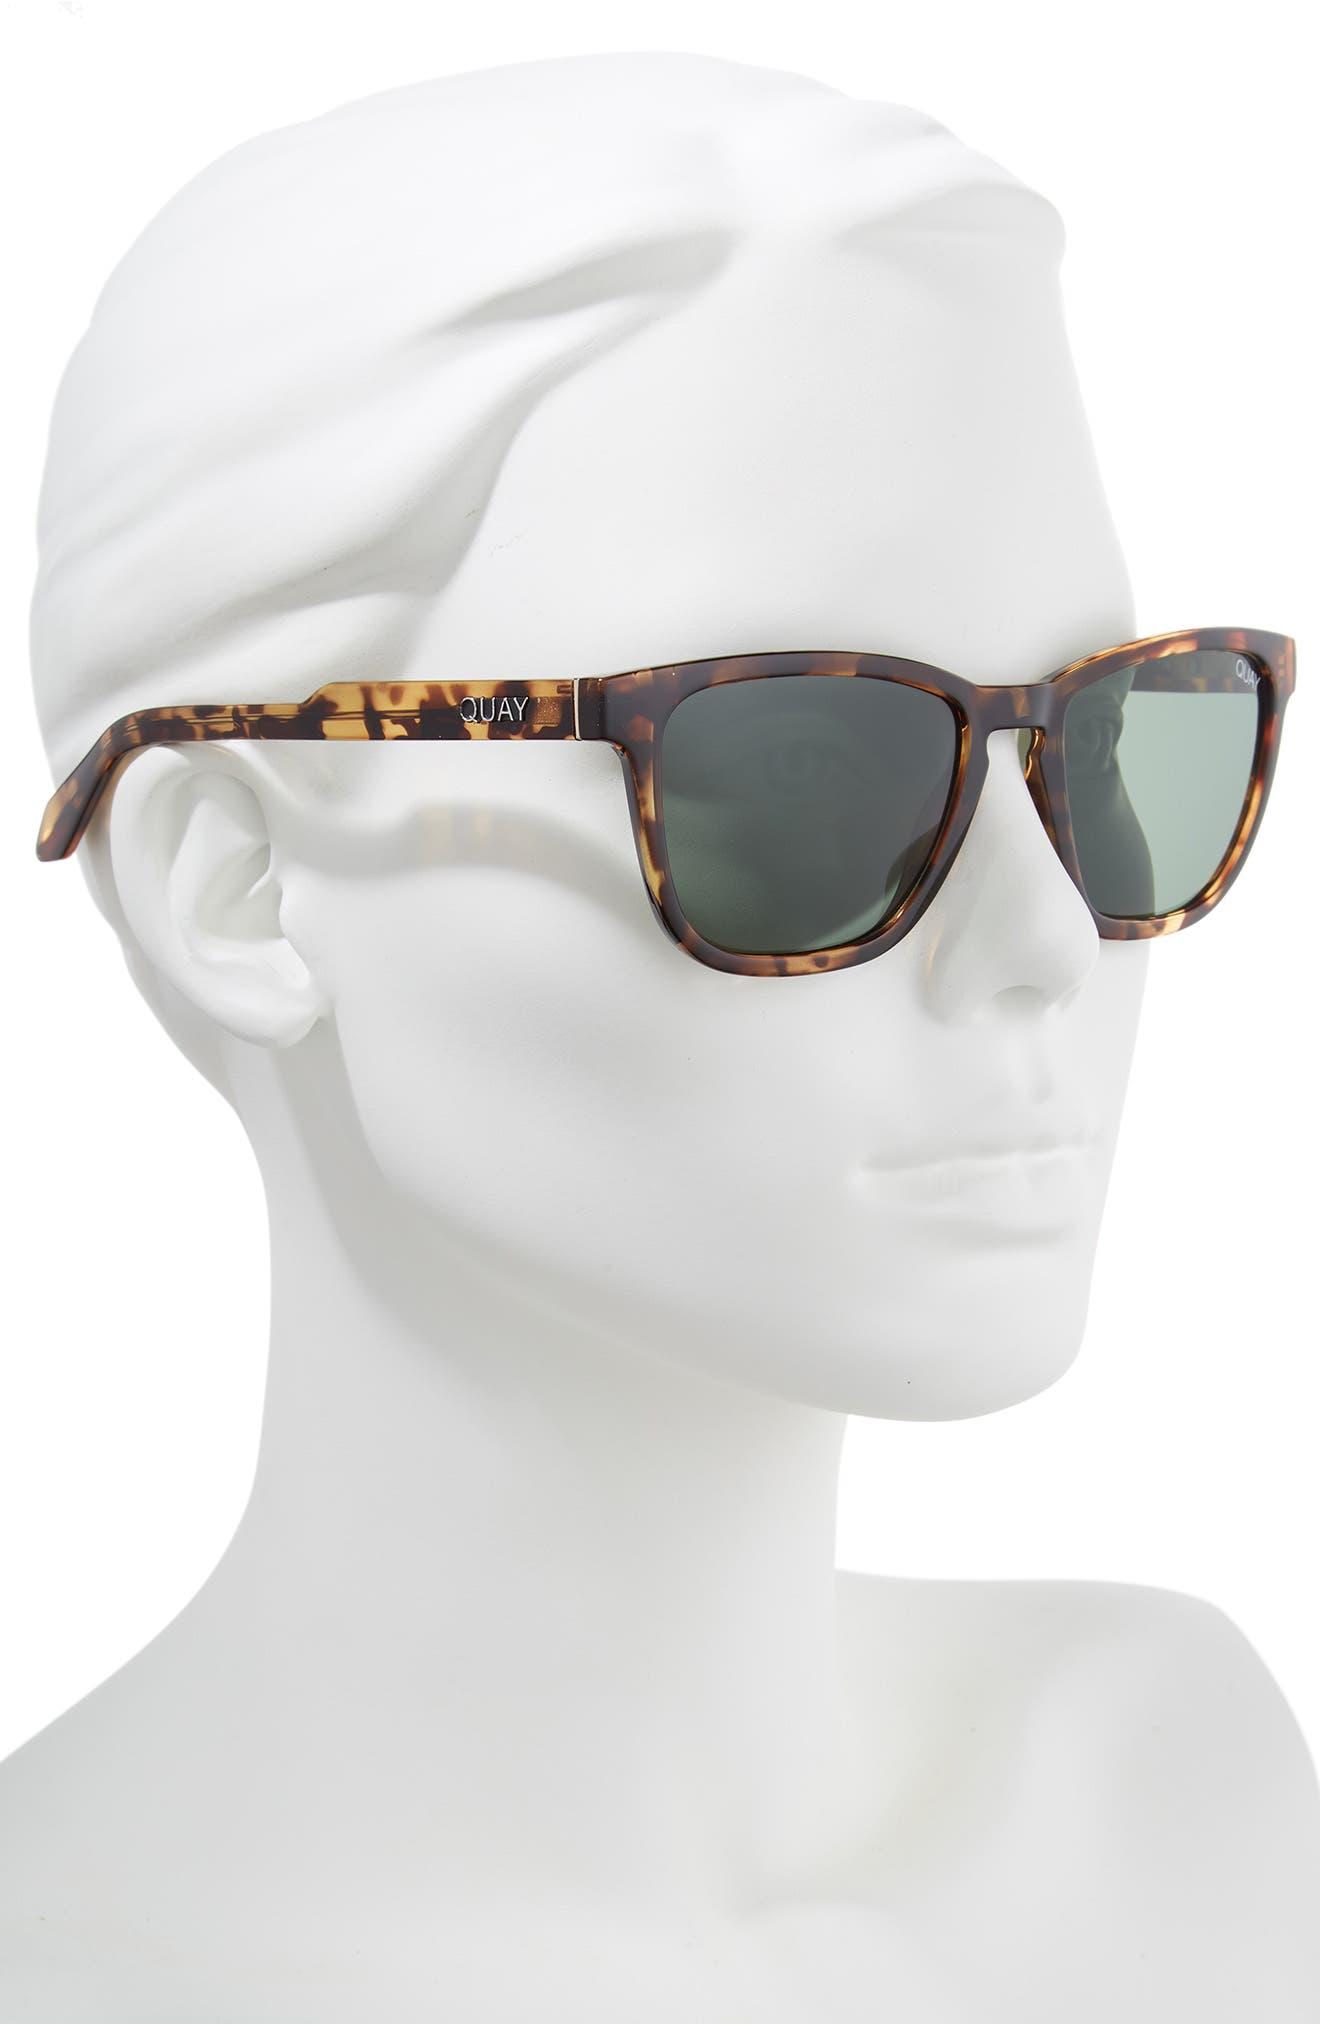 Hardwire 54mm Polarized Sunglasses,                             Alternate thumbnail 2, color,                             TORT/ GREEN LENS